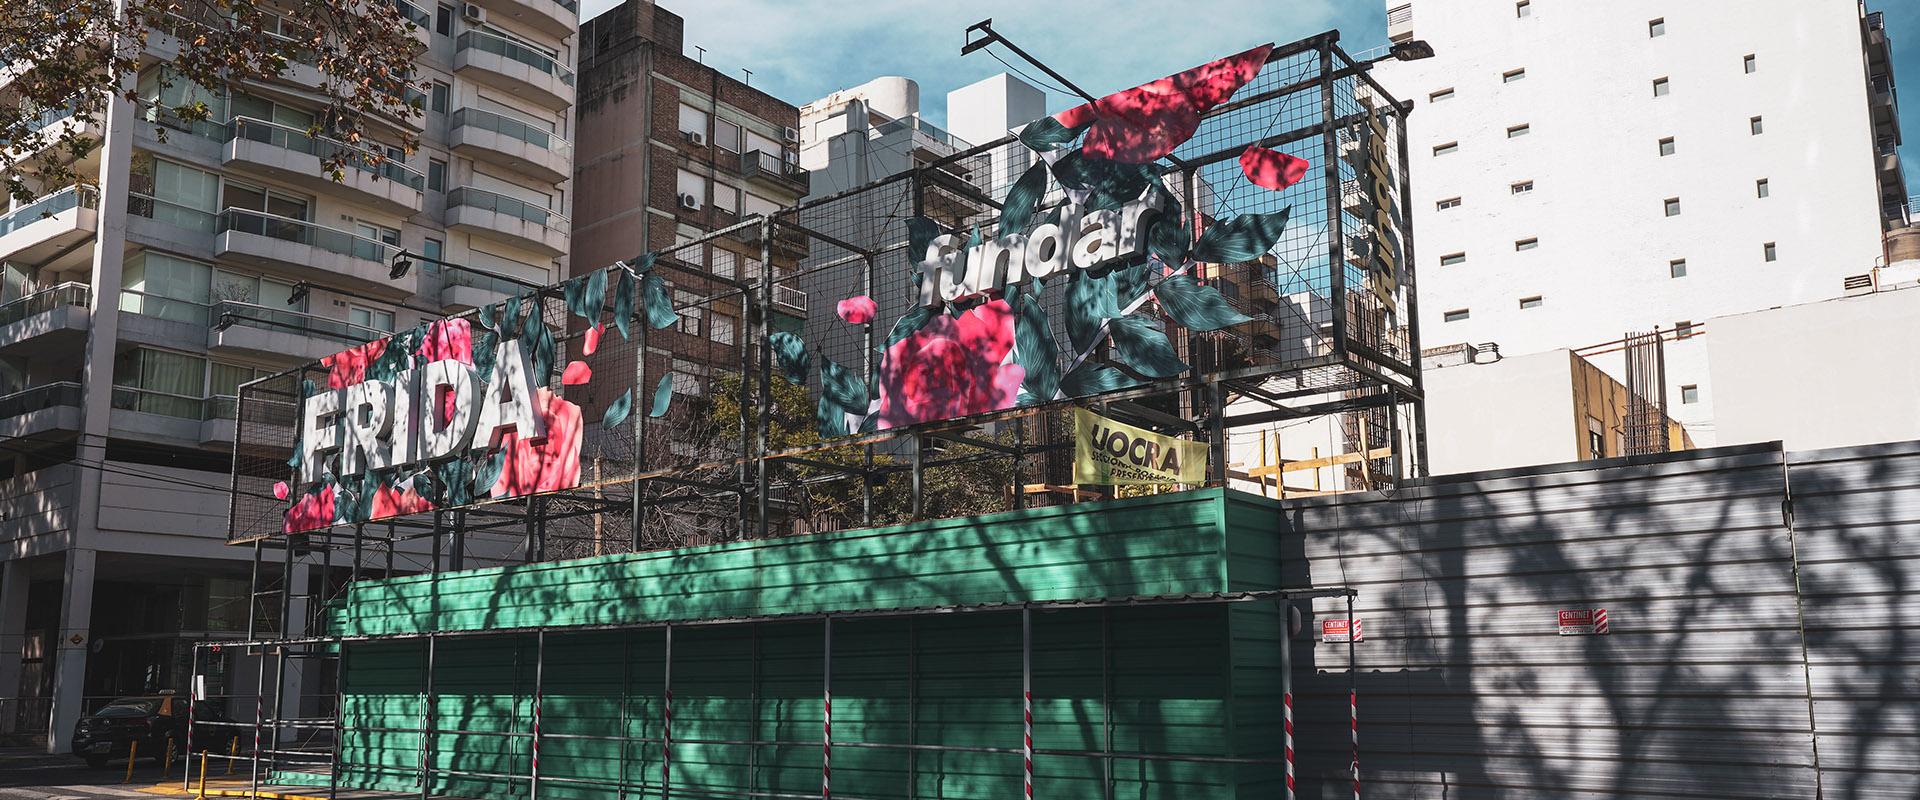 Frida - Julio 2020 Avance de Obra